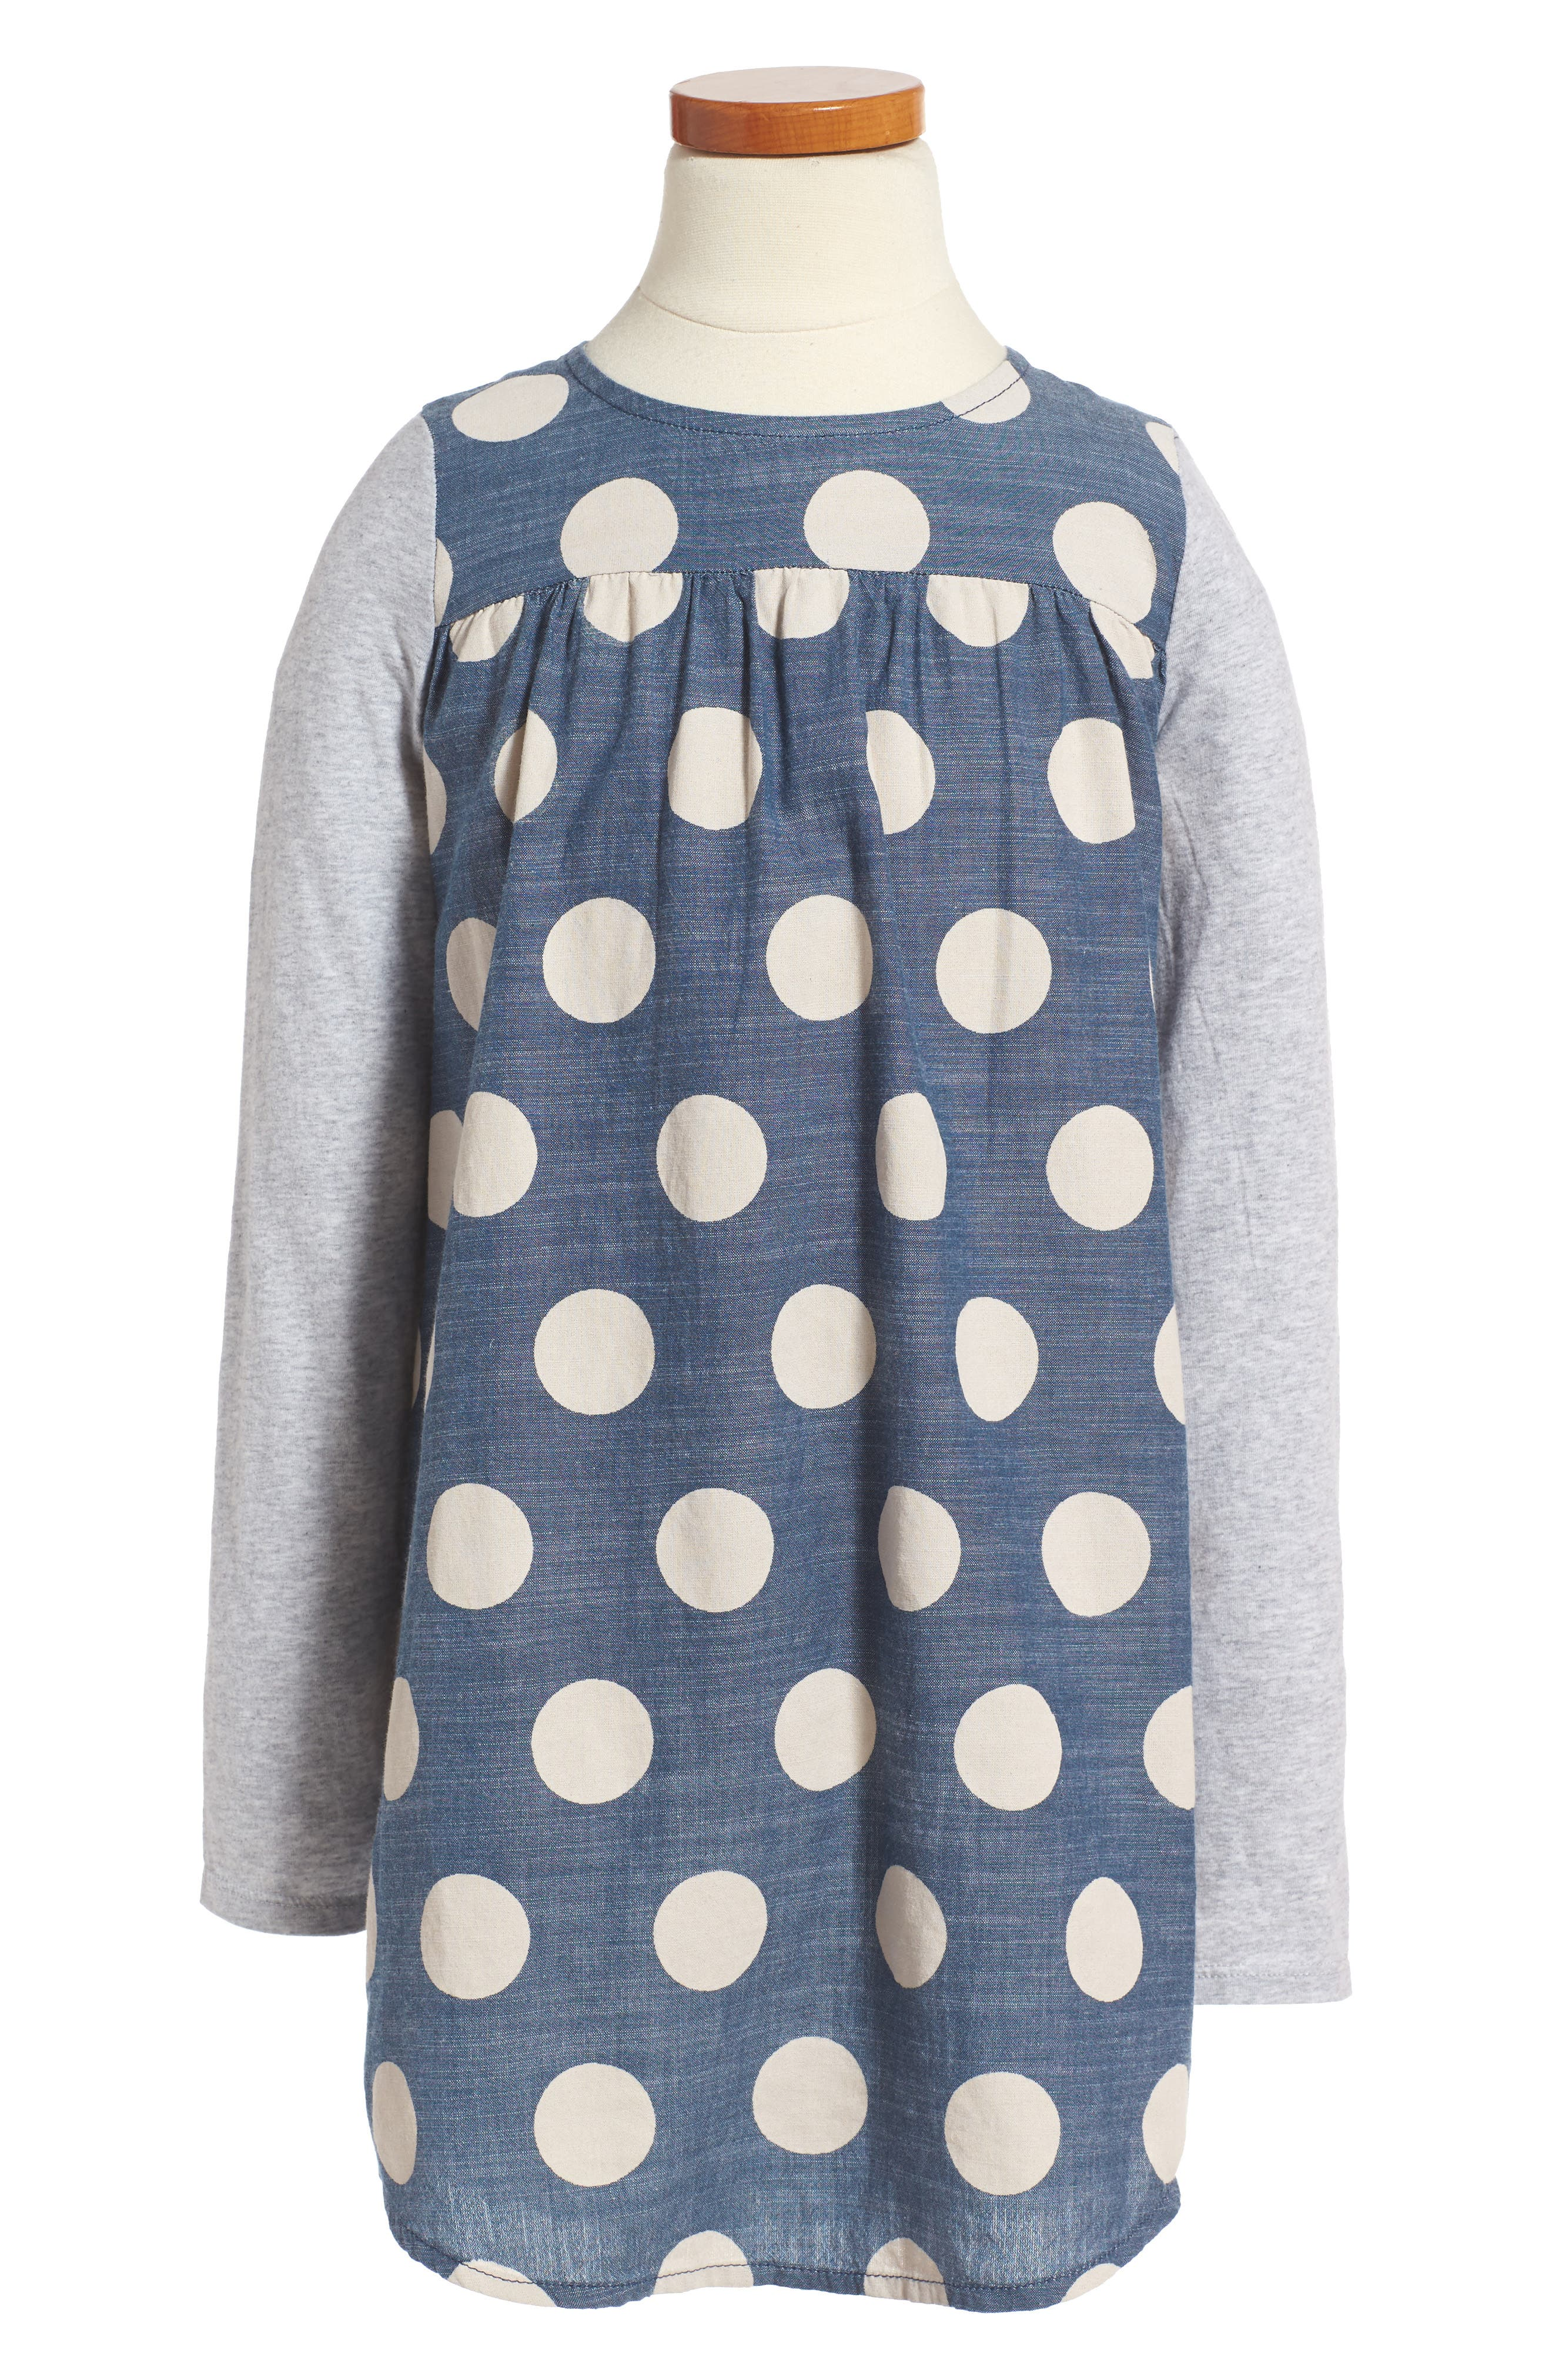 TUCKER + TATE Big Dot Woven Dress